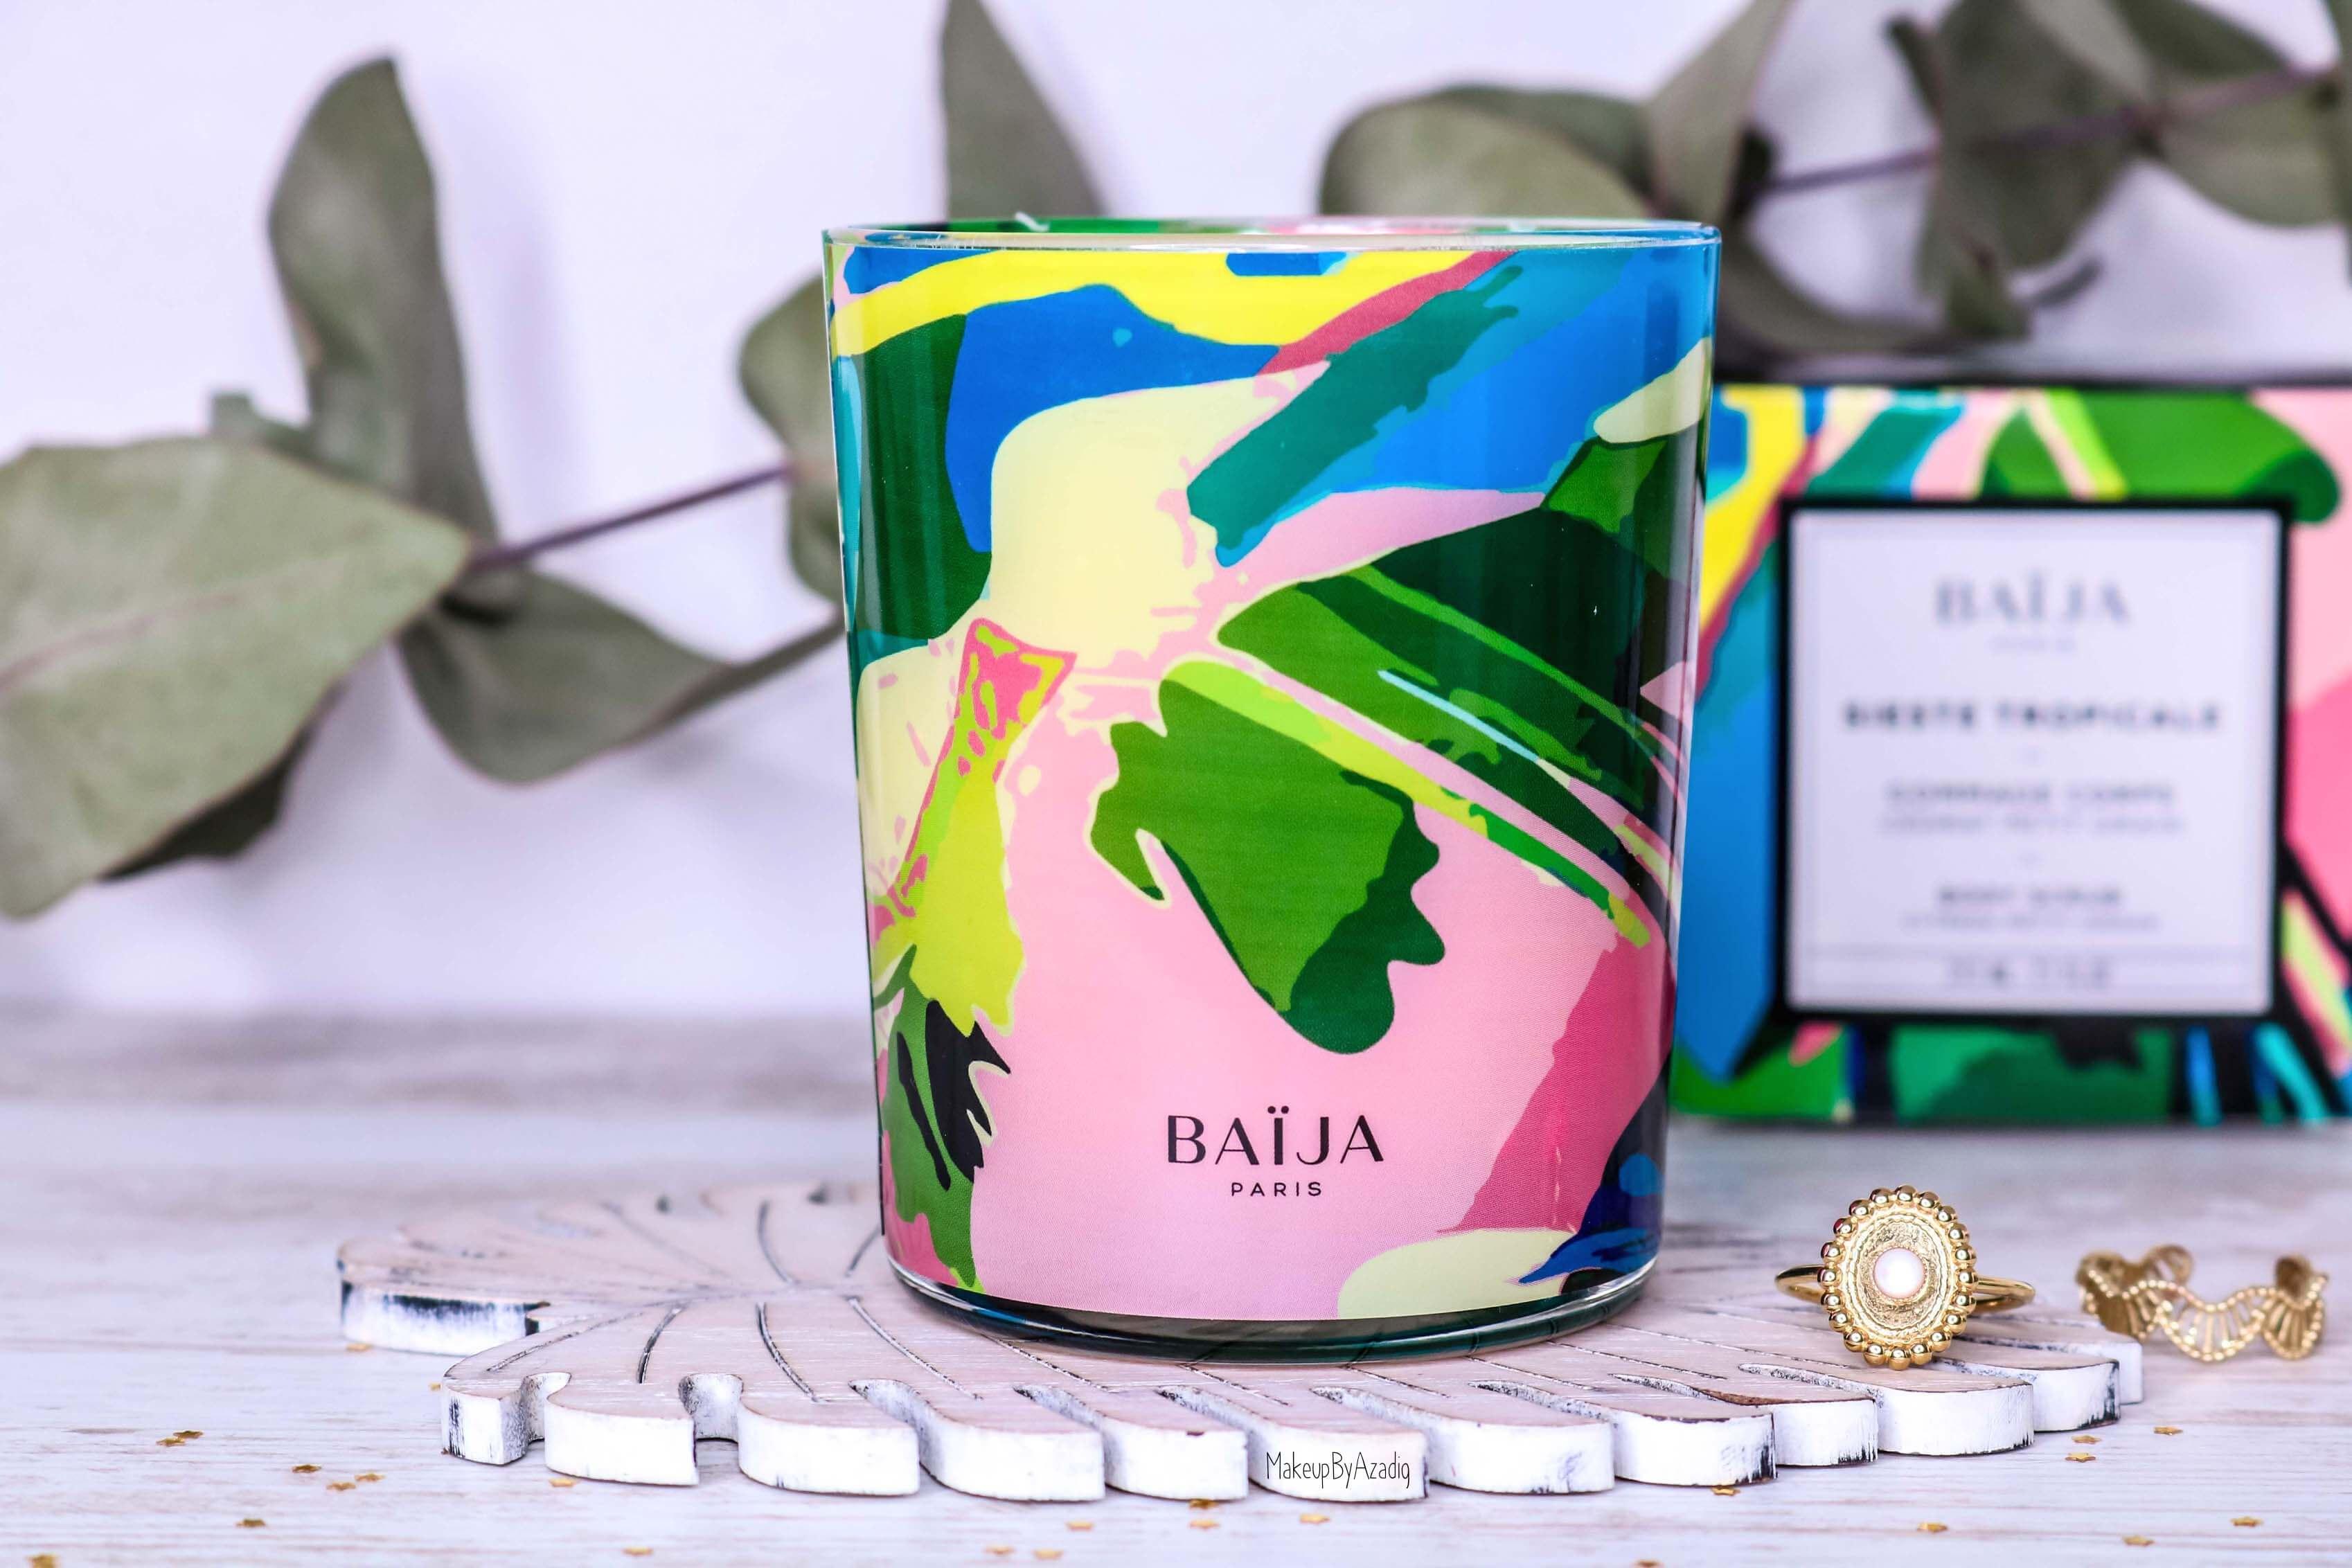 revue-collection-sieste-tropicale-baija--cedrat-paris-corps-bougie-gommage-soin-citron-makeupbyazadig-avis-prix-sephora-candle